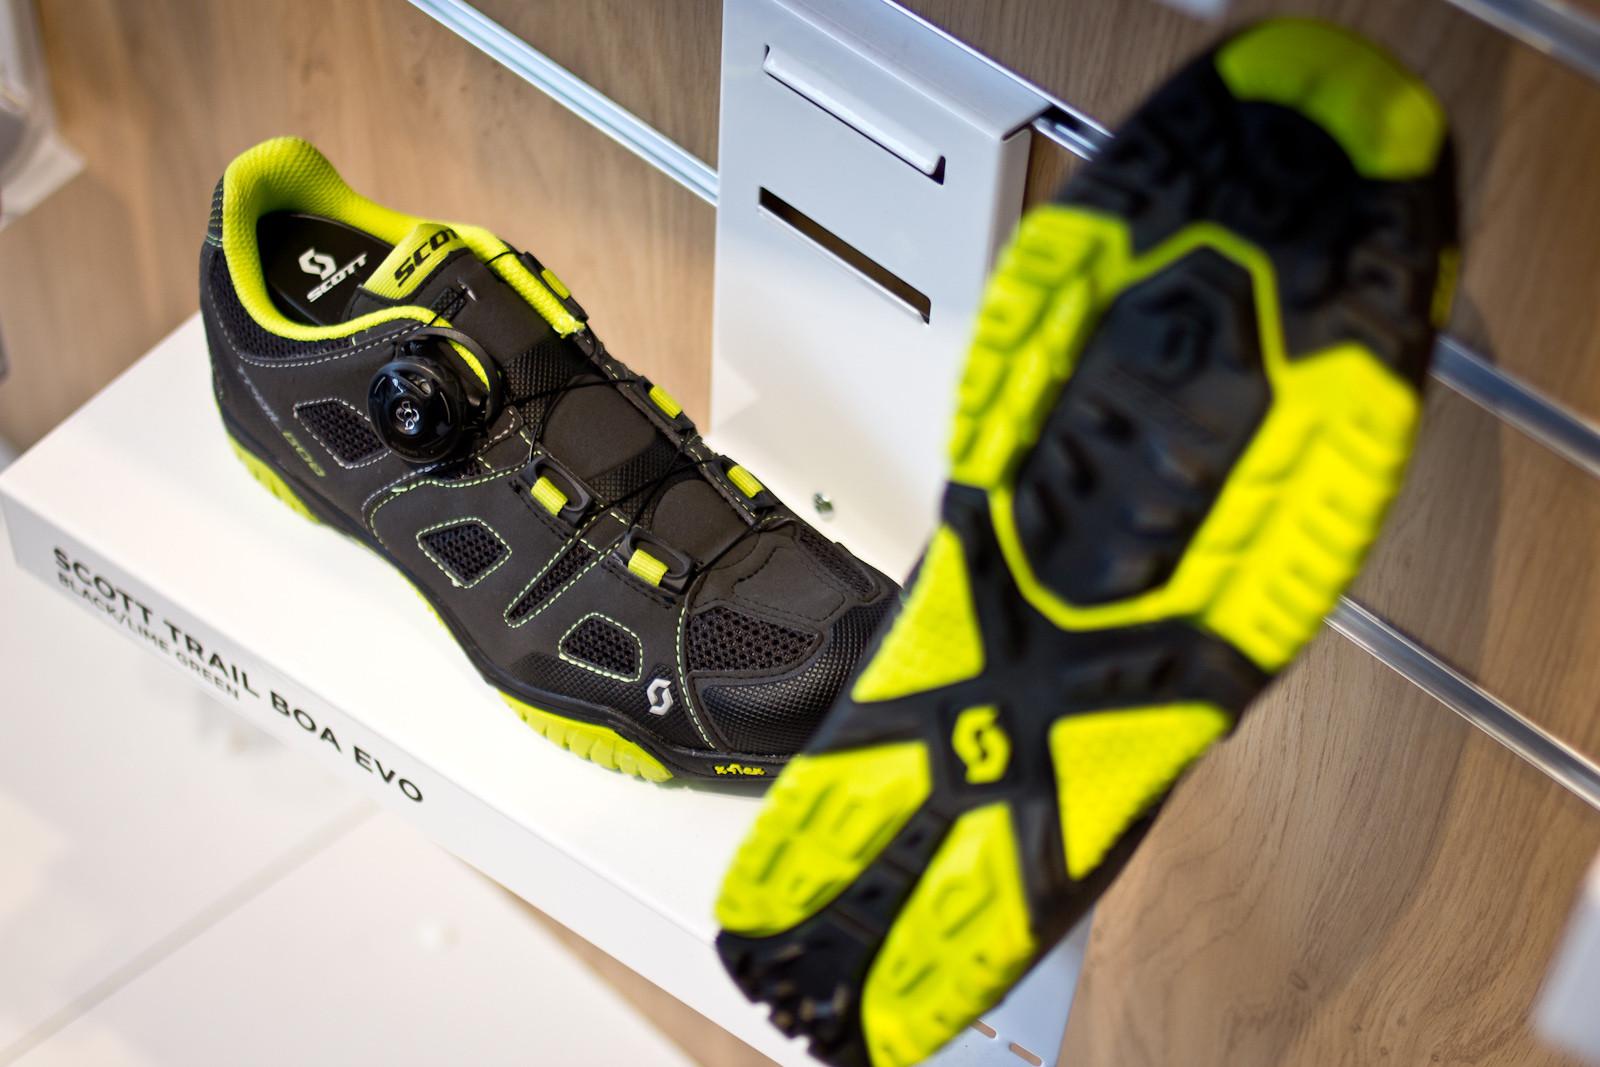 Scott Trail Boa EVO Shoes - 2014 Mountain Bike Apparel & Protection at Eurobike 2013 - Mountain Biking Pictures - Vital MTB